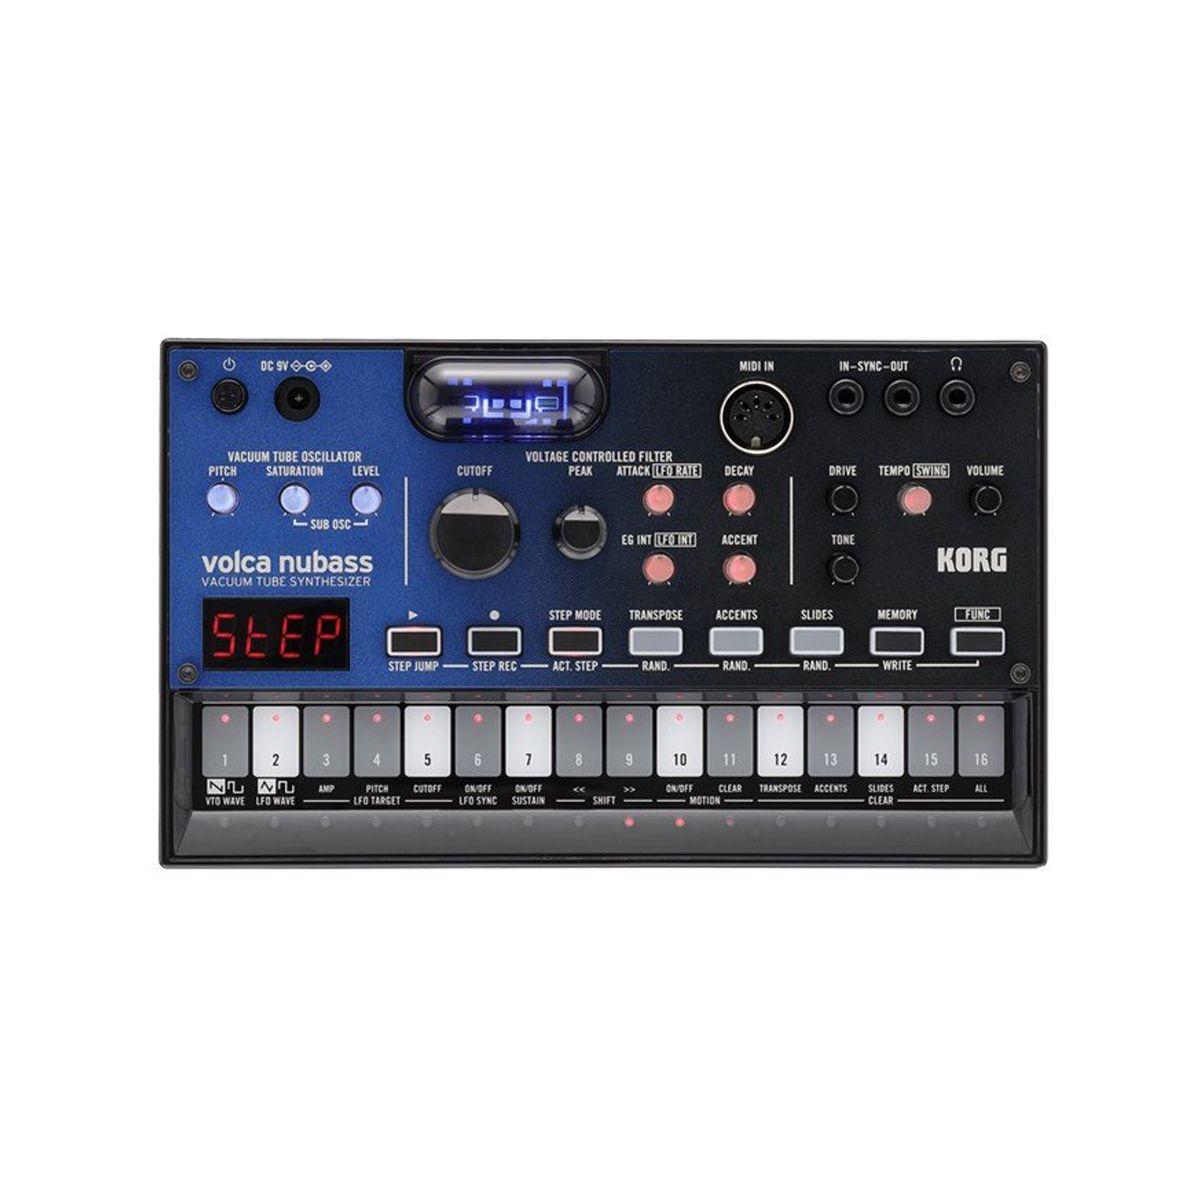 Korg Volca Nubass Desktop Analogue Bass Synth